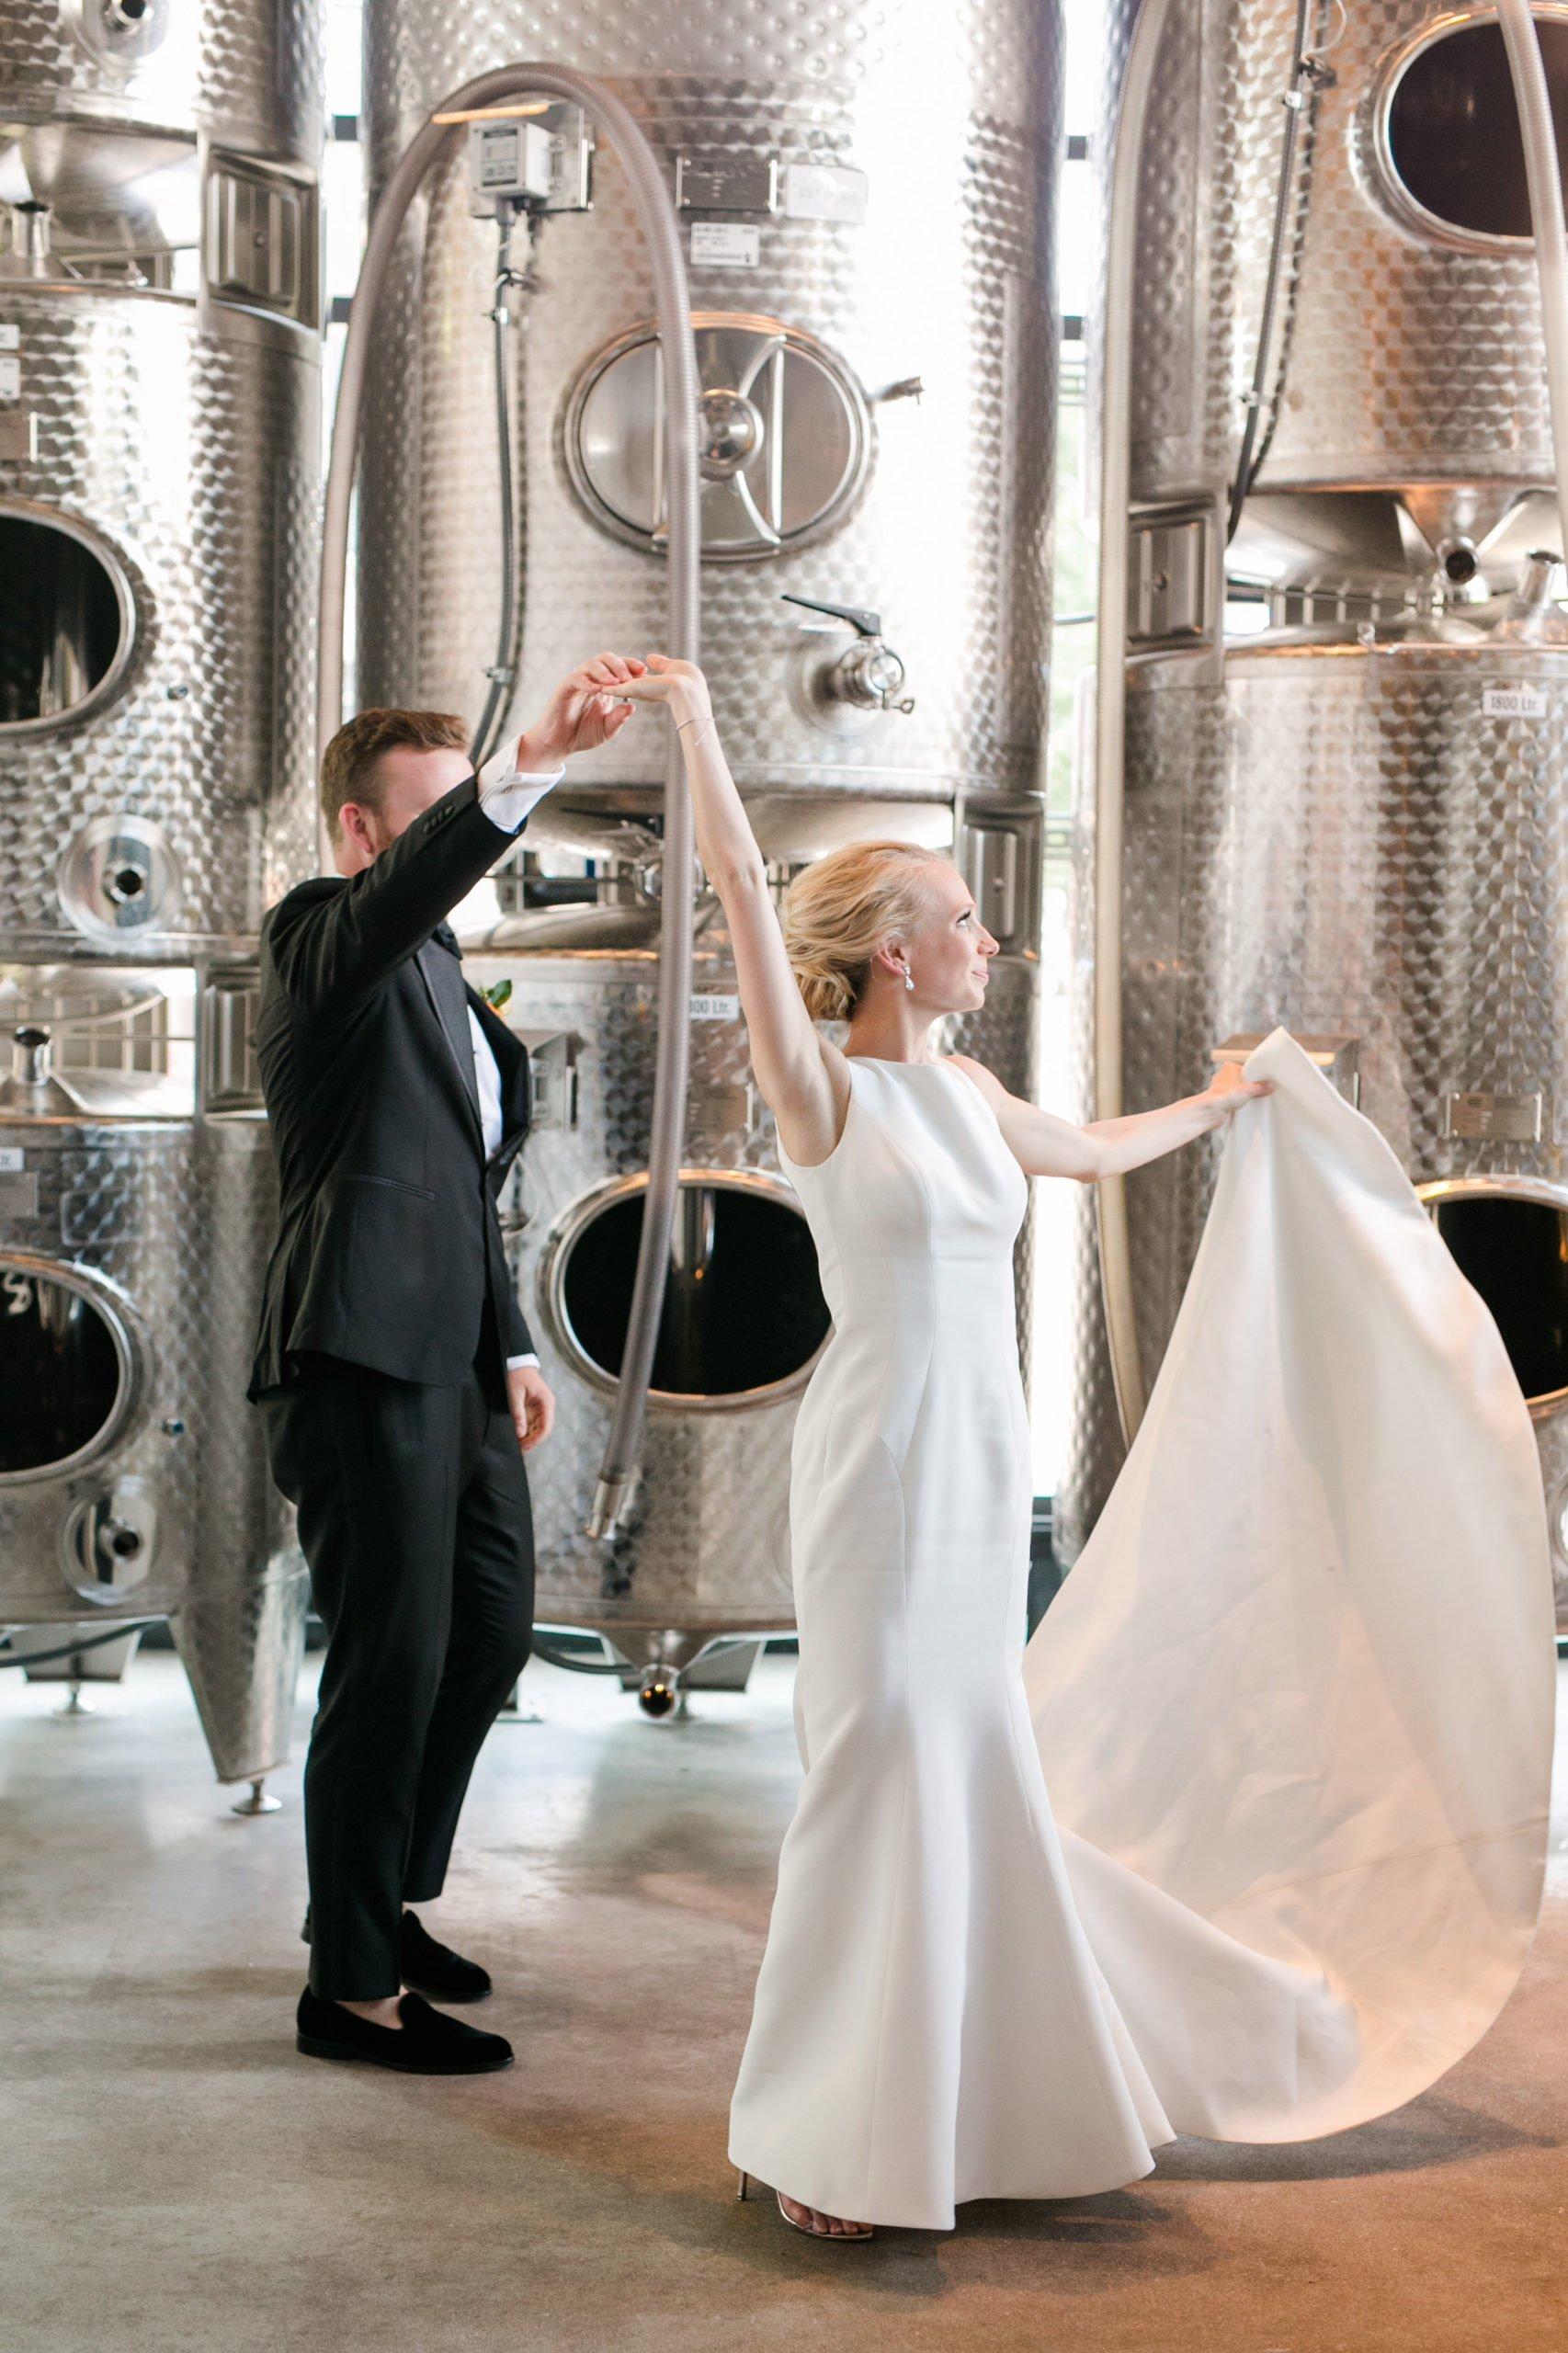 View More: https://kristengardner.pass.us/emma-and-tyler-wedding